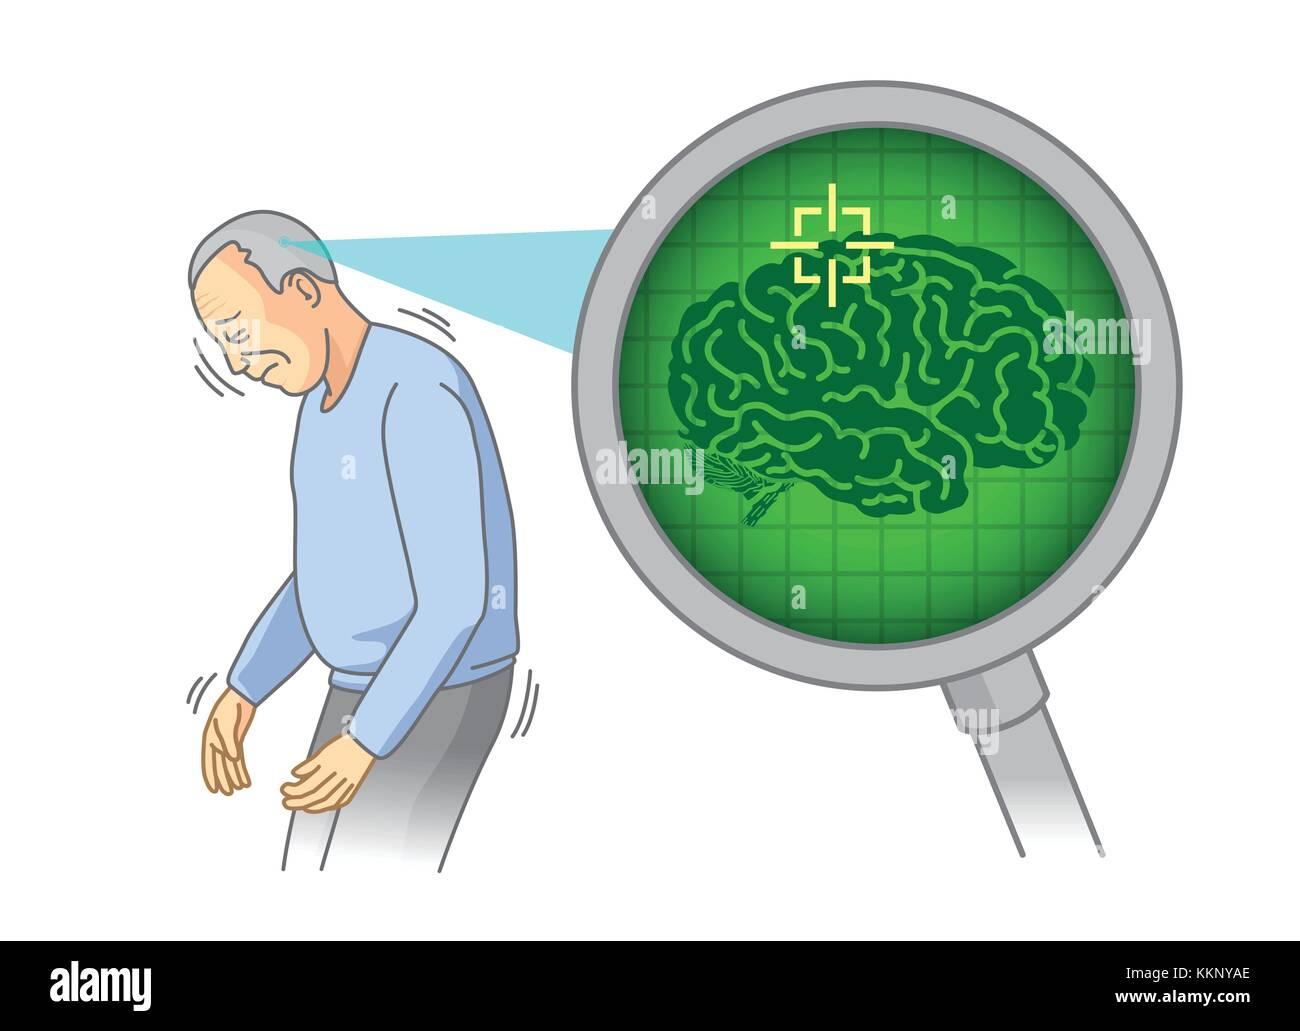 Looking Inside Brain Stock Photos & Looking Inside Brain Stock ...